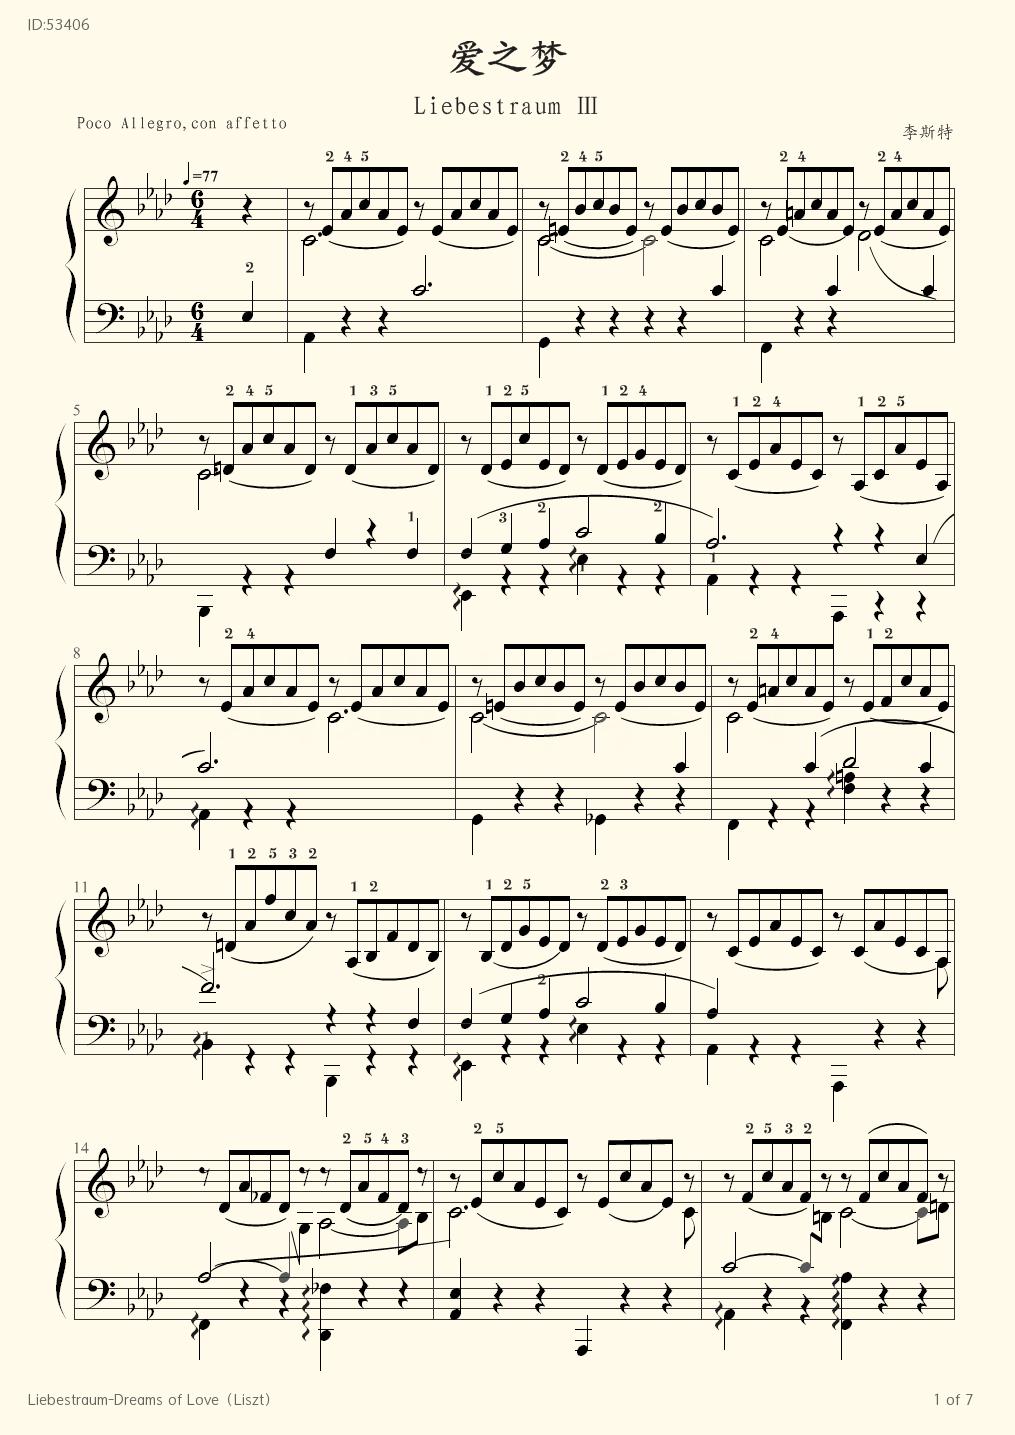 Liebestraum Dreams of Love Liszt - Franz Liszt - first page